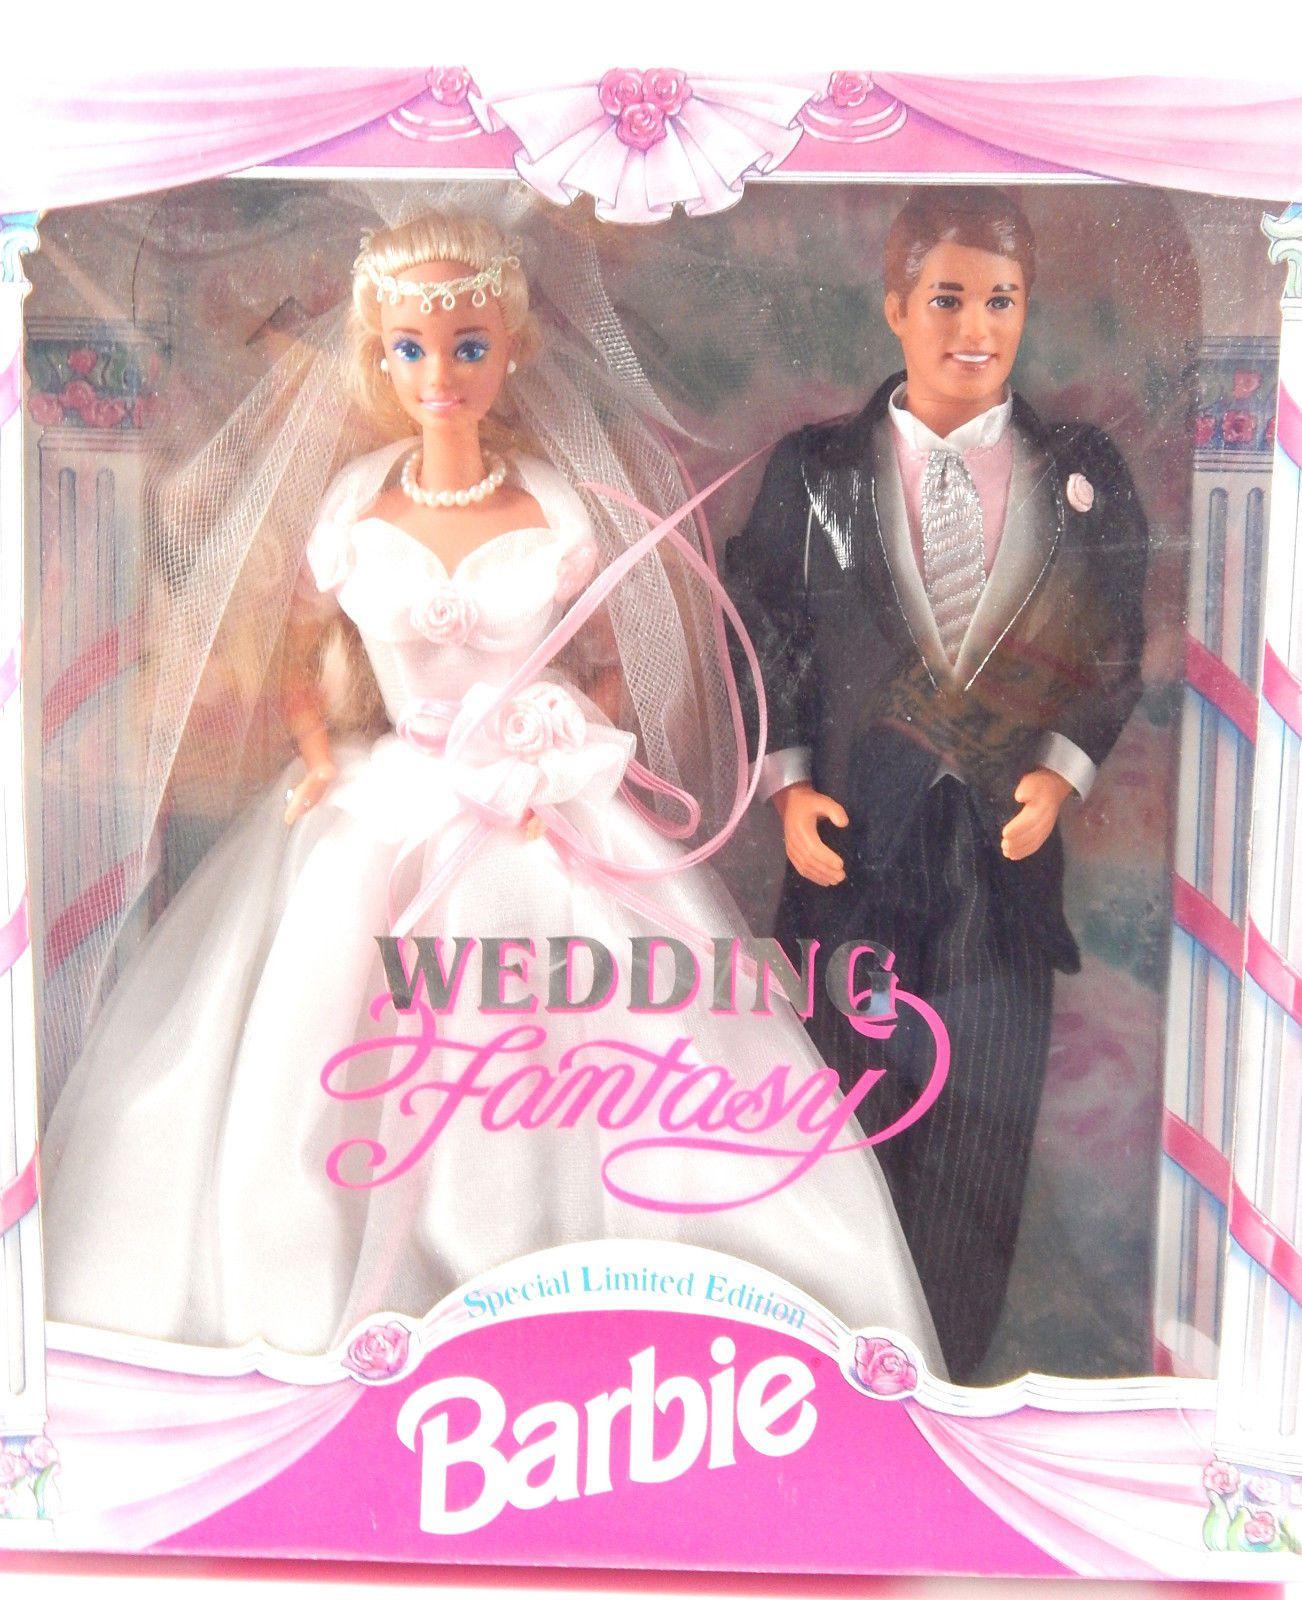 1993 Wedding Fantasy Barbie Gift Set, BARBIE & FRIENDS